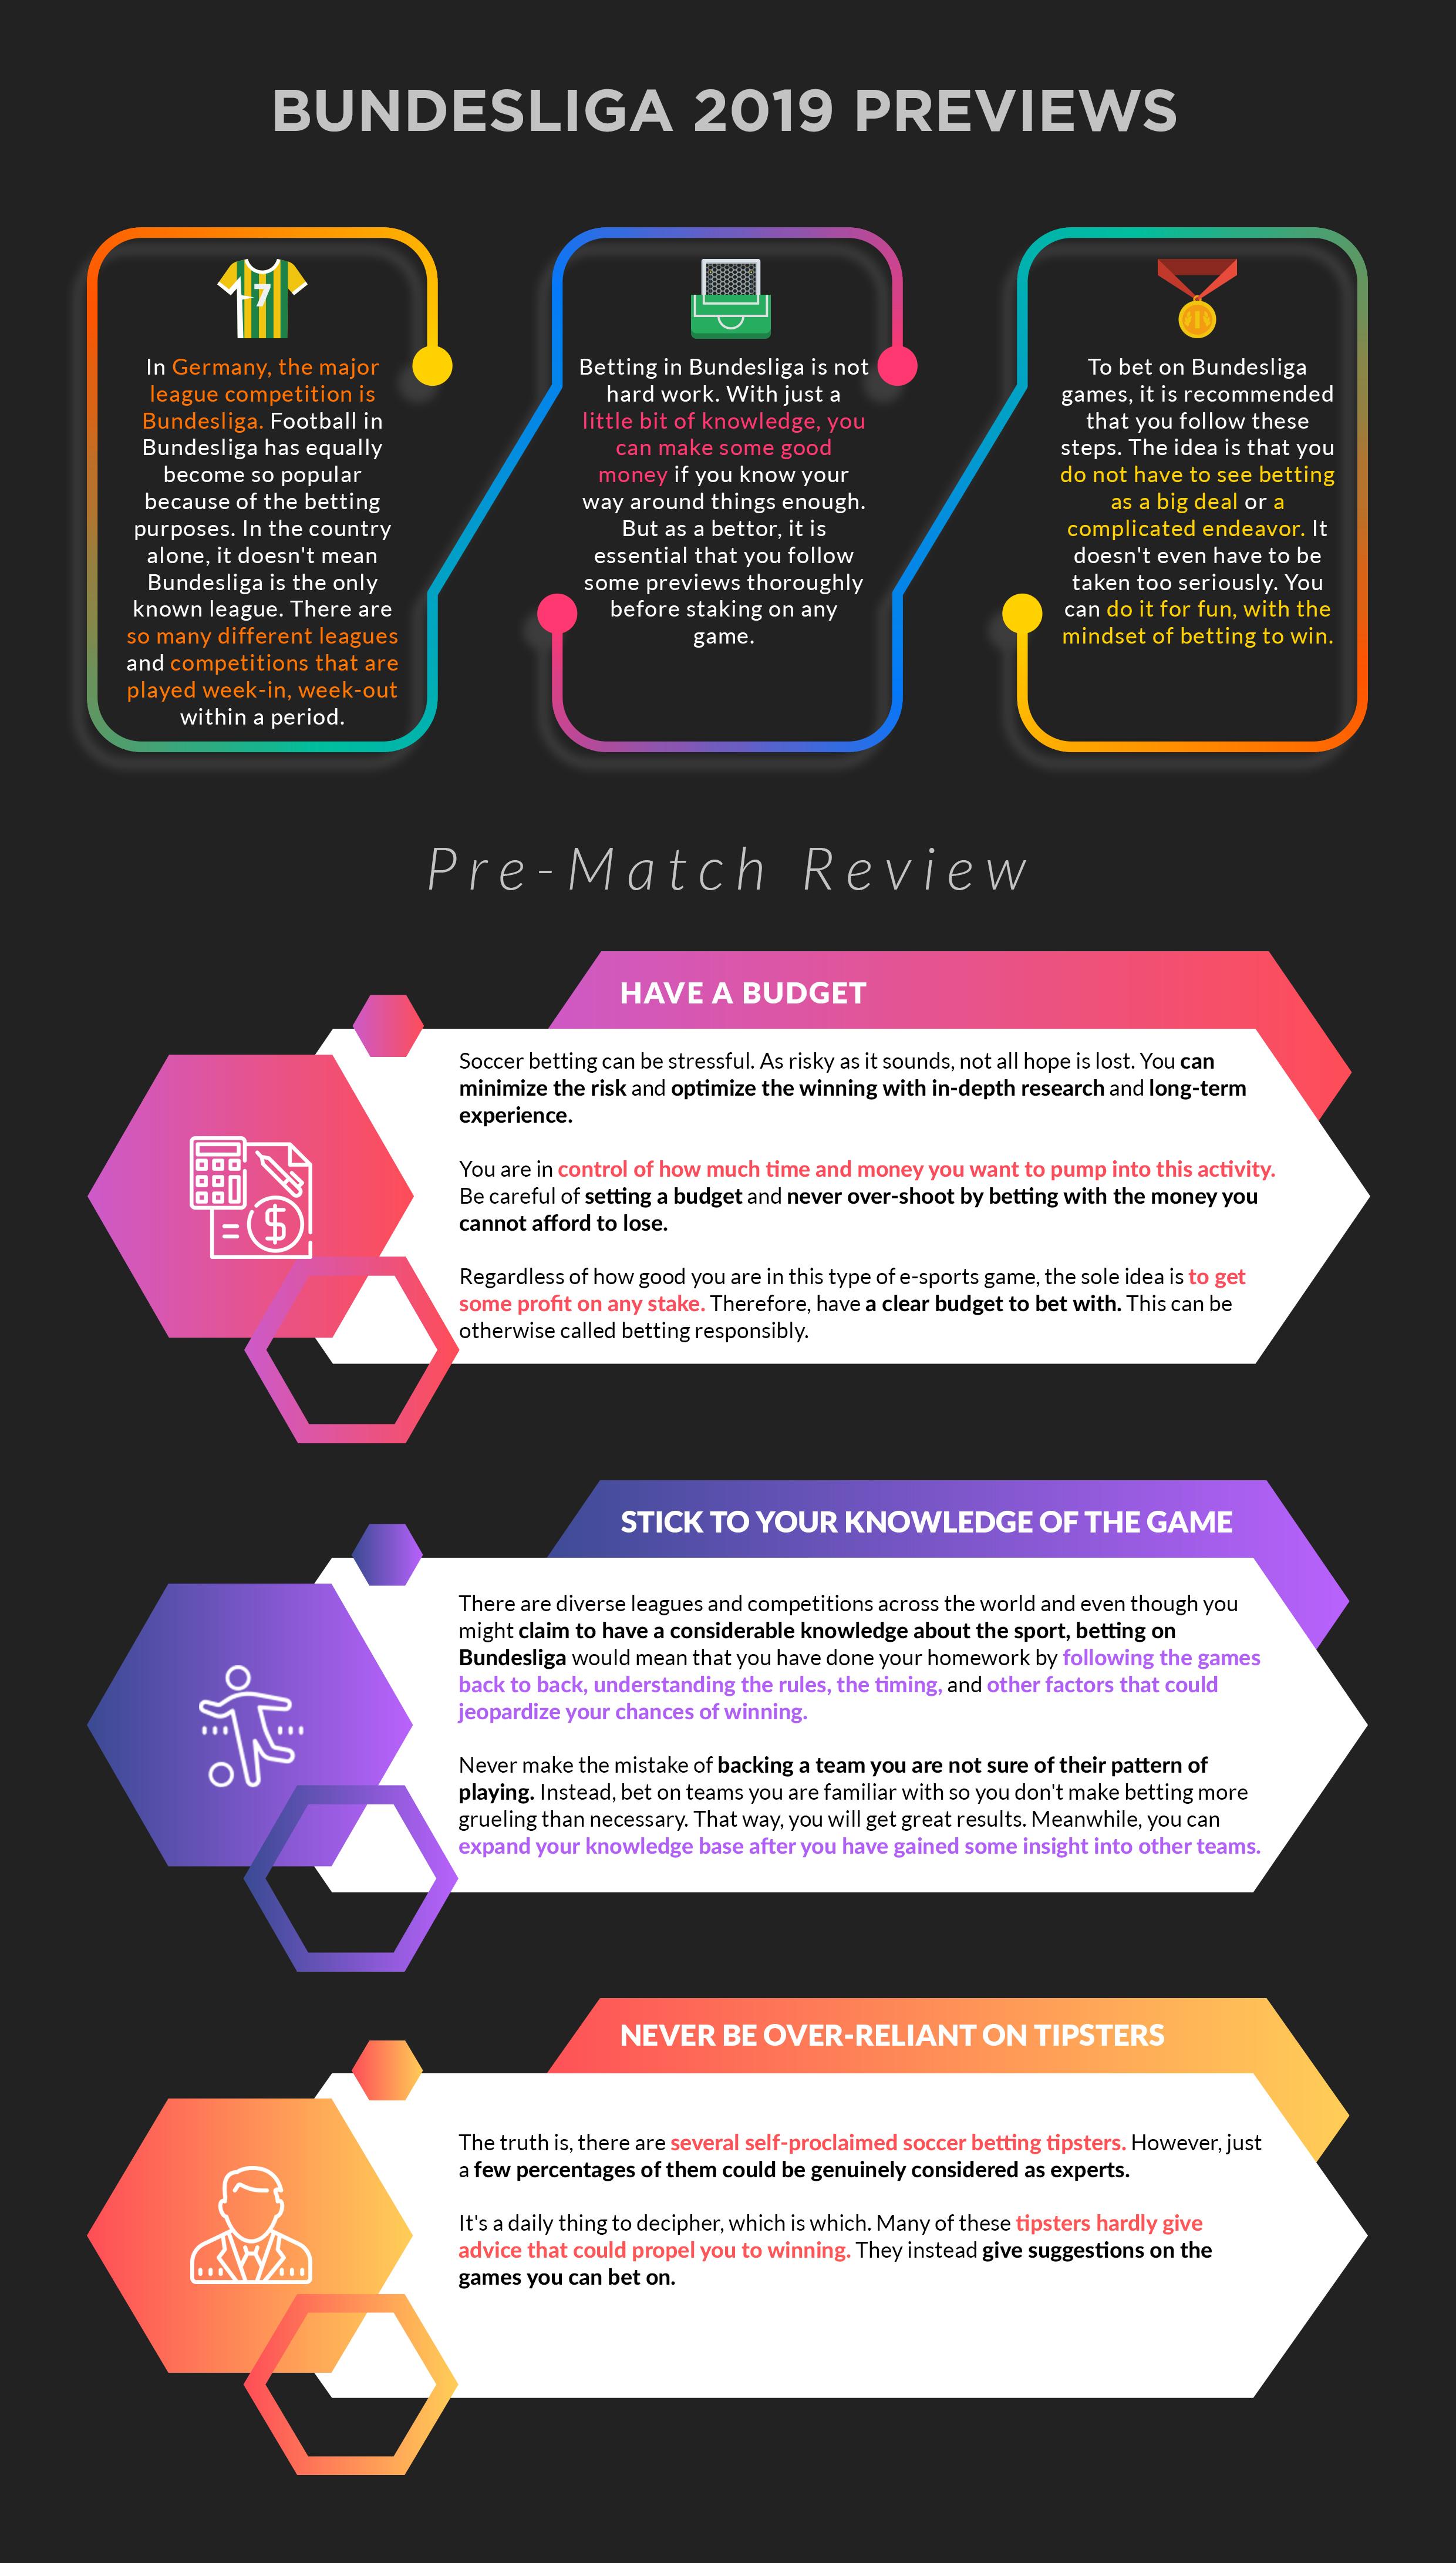 Bundesliga 2019 Previews Infographic